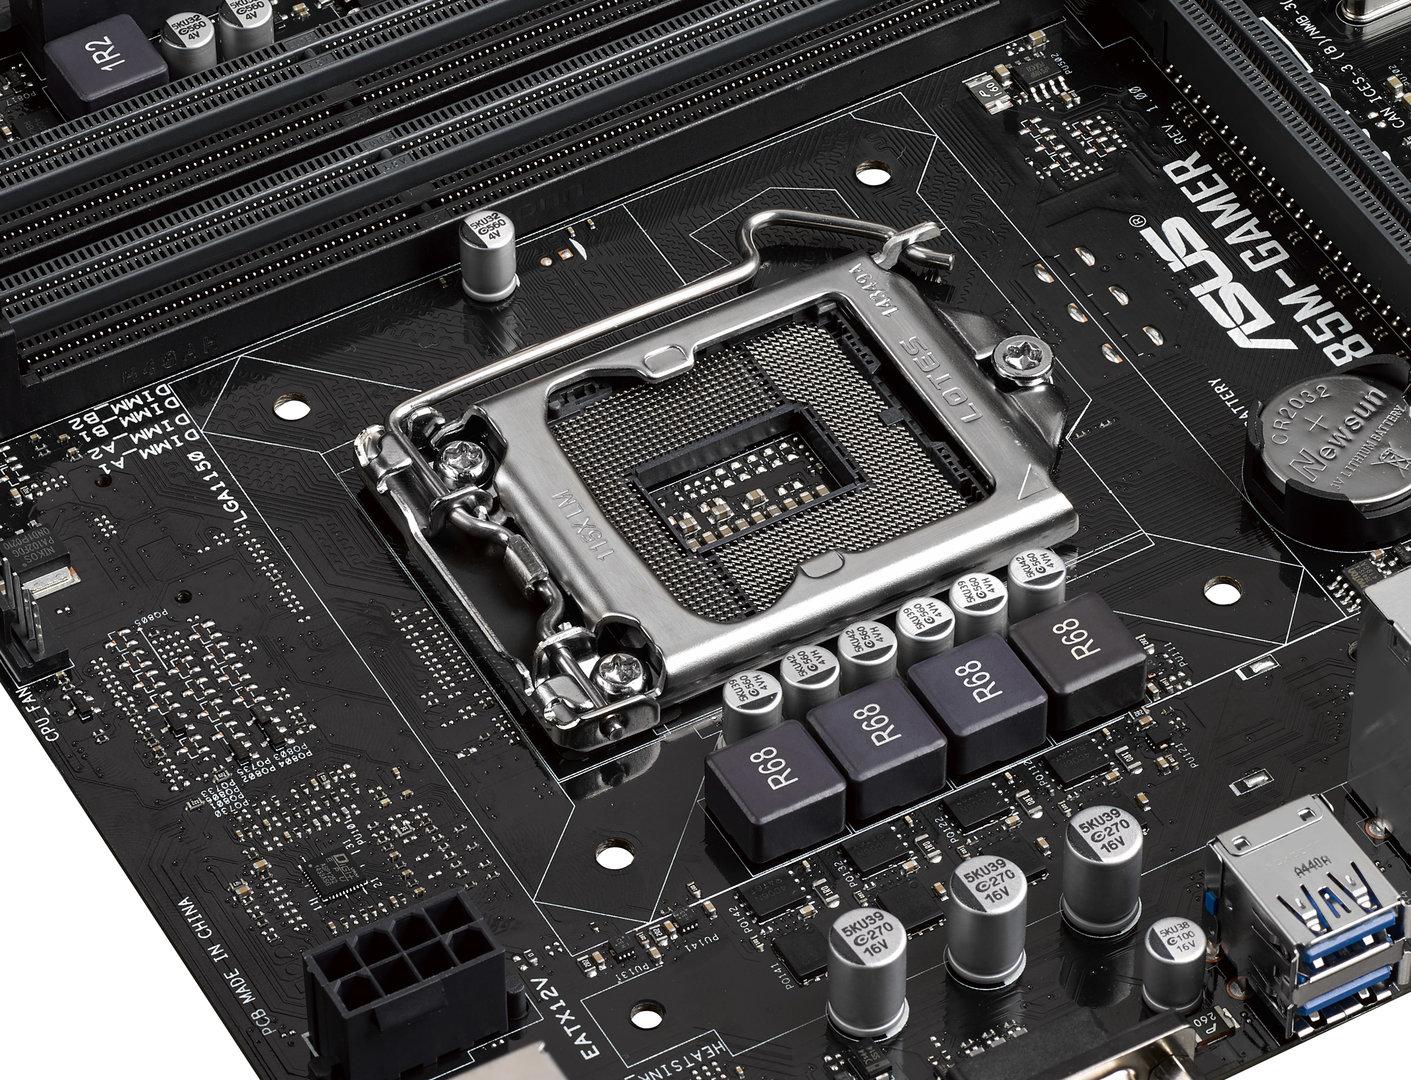 Asus B85M-Gamer – CPU-Sockel mit Spannungsversorgung